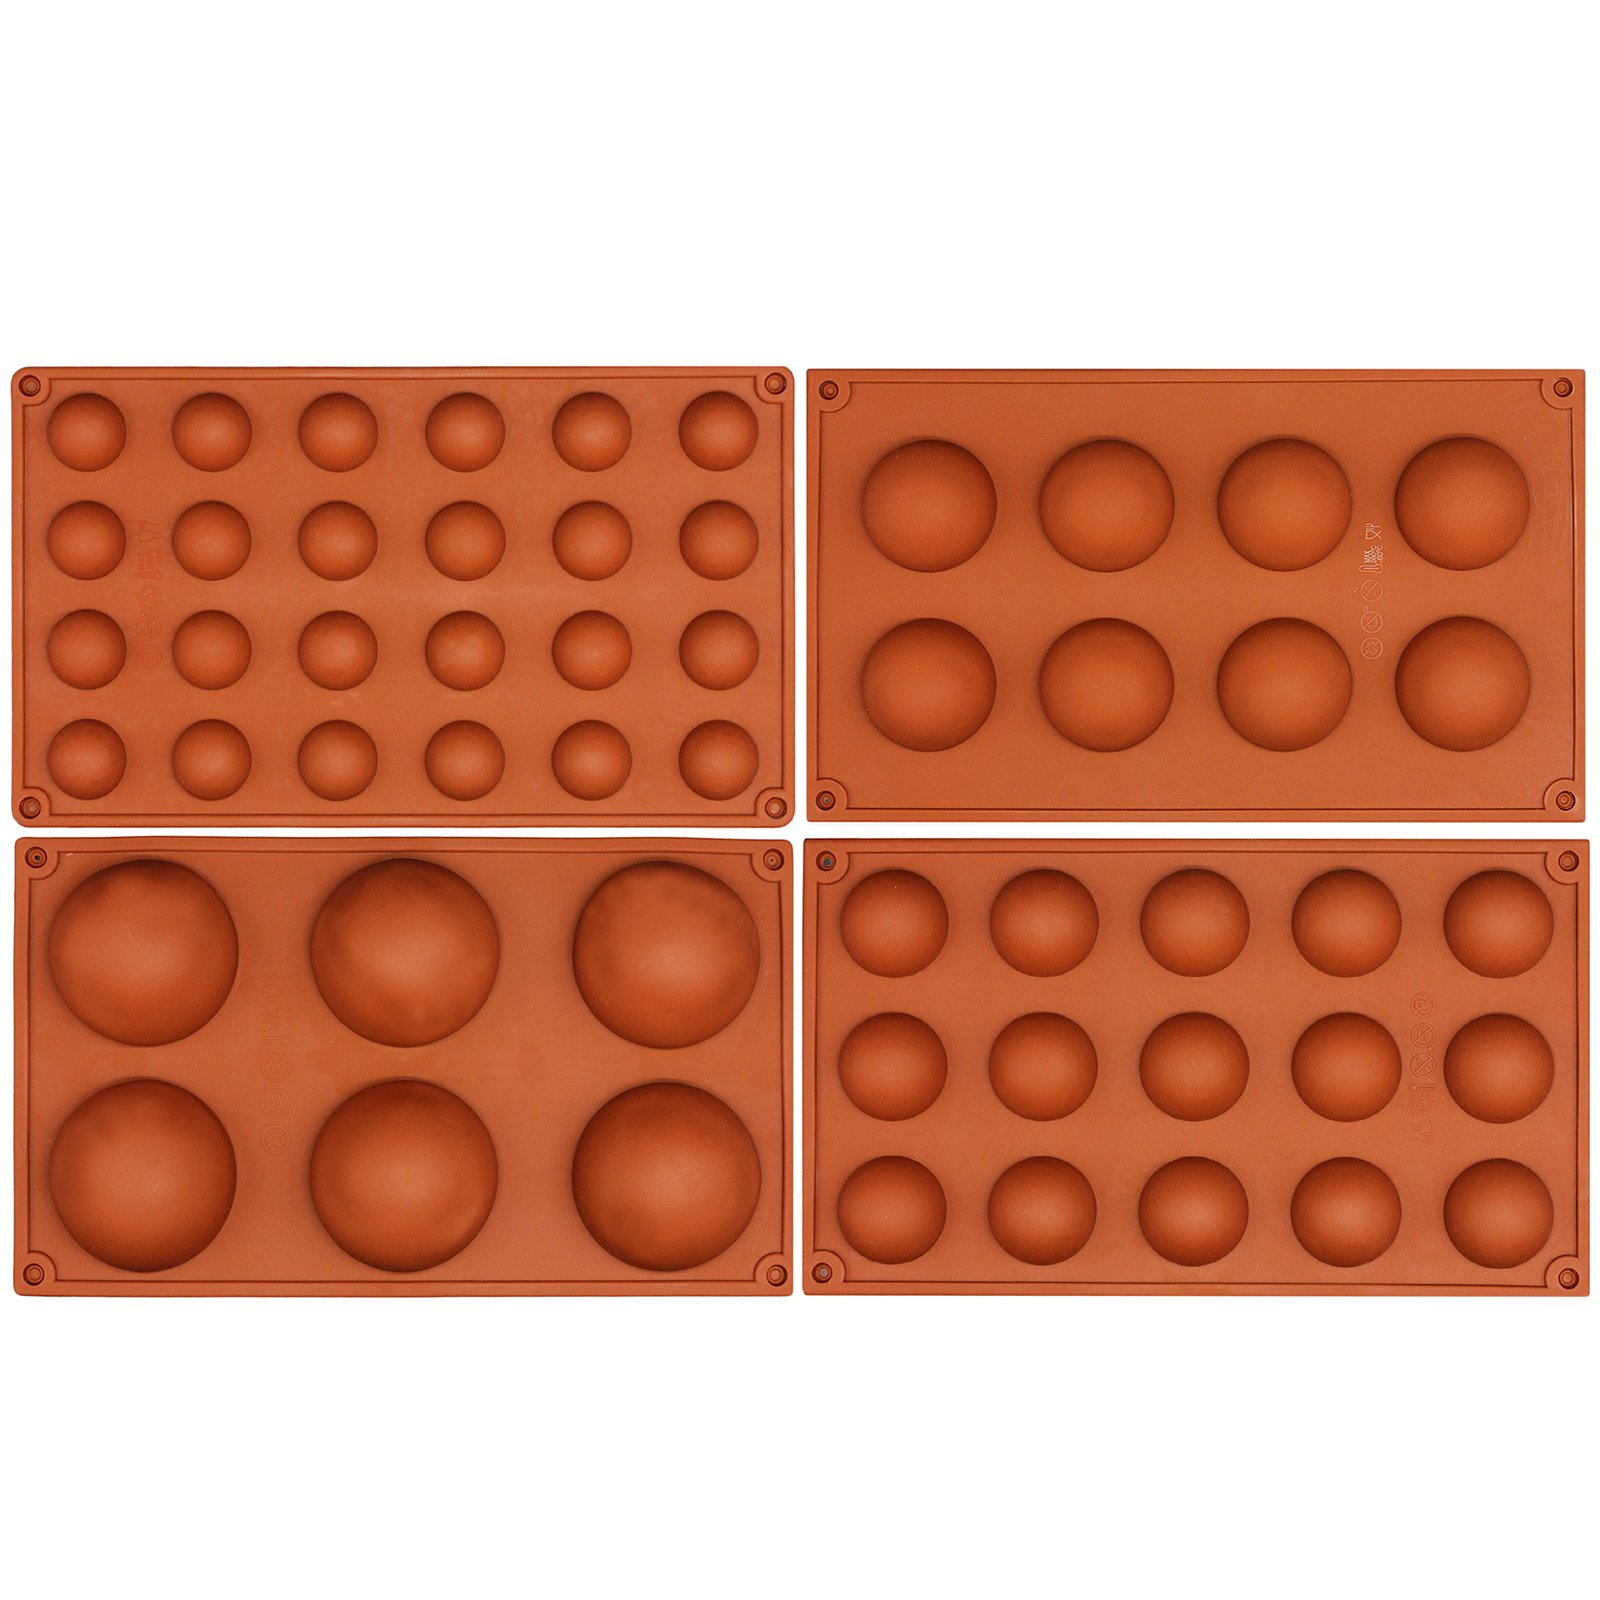 Funshowcase Half Circle Silicone Mold Bombe Teacake Baking Pan Assorted Size 4 in Set